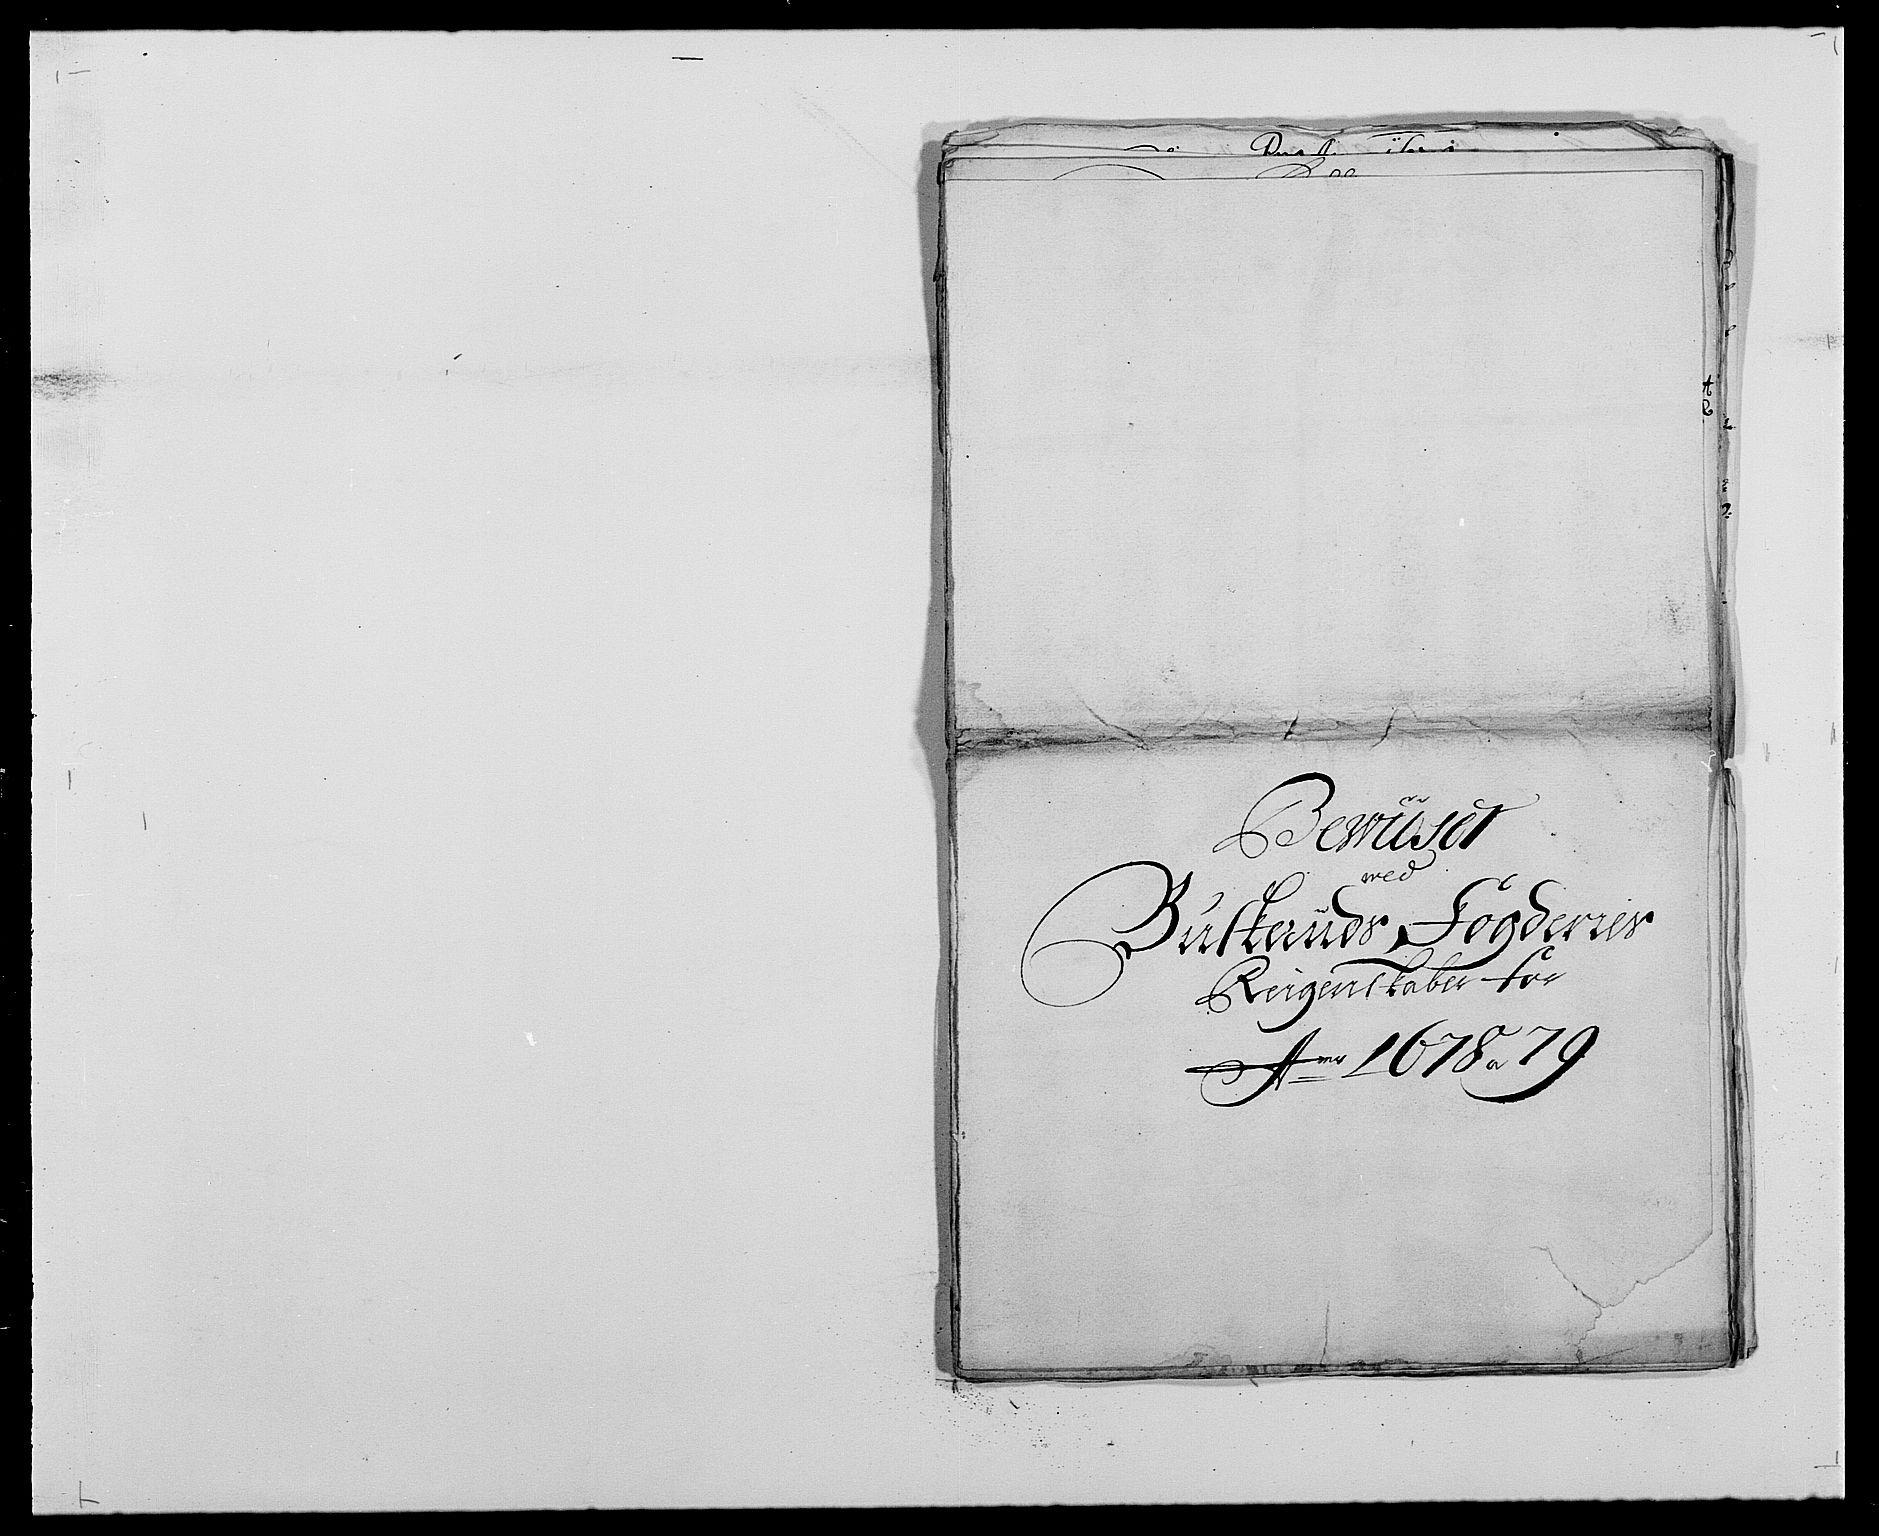 RA, Rentekammeret inntil 1814, Reviderte regnskaper, Fogderegnskap, R25/L1674: Fogderegnskap Buskerud, 1678-1681, s. 389